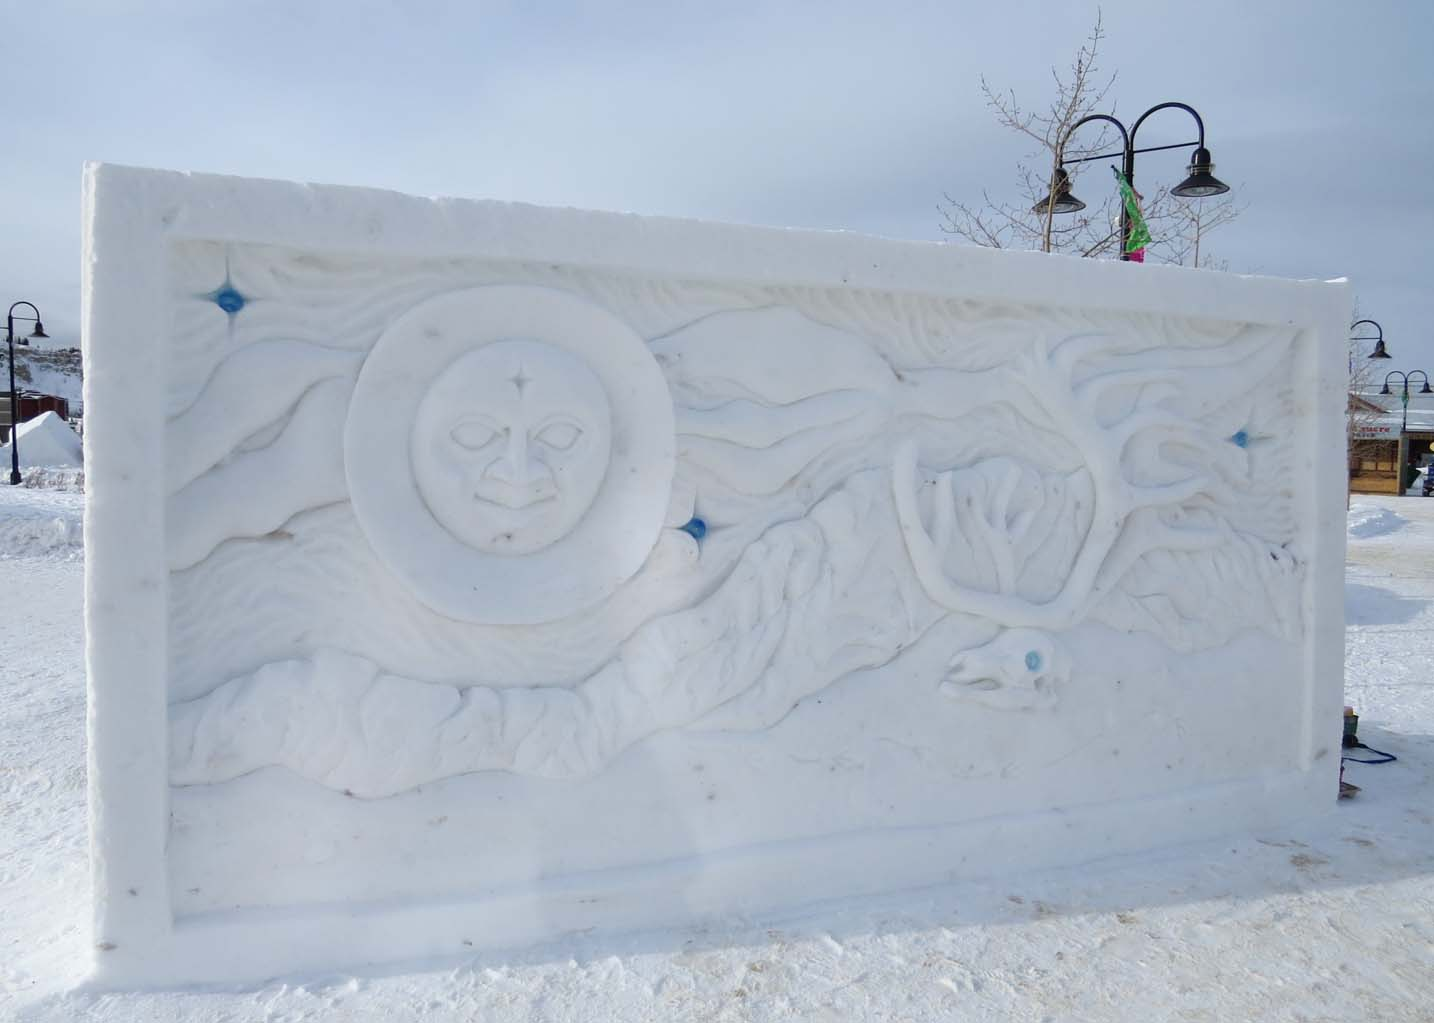 rendezvous festival sculpture in whitehorse, yukon